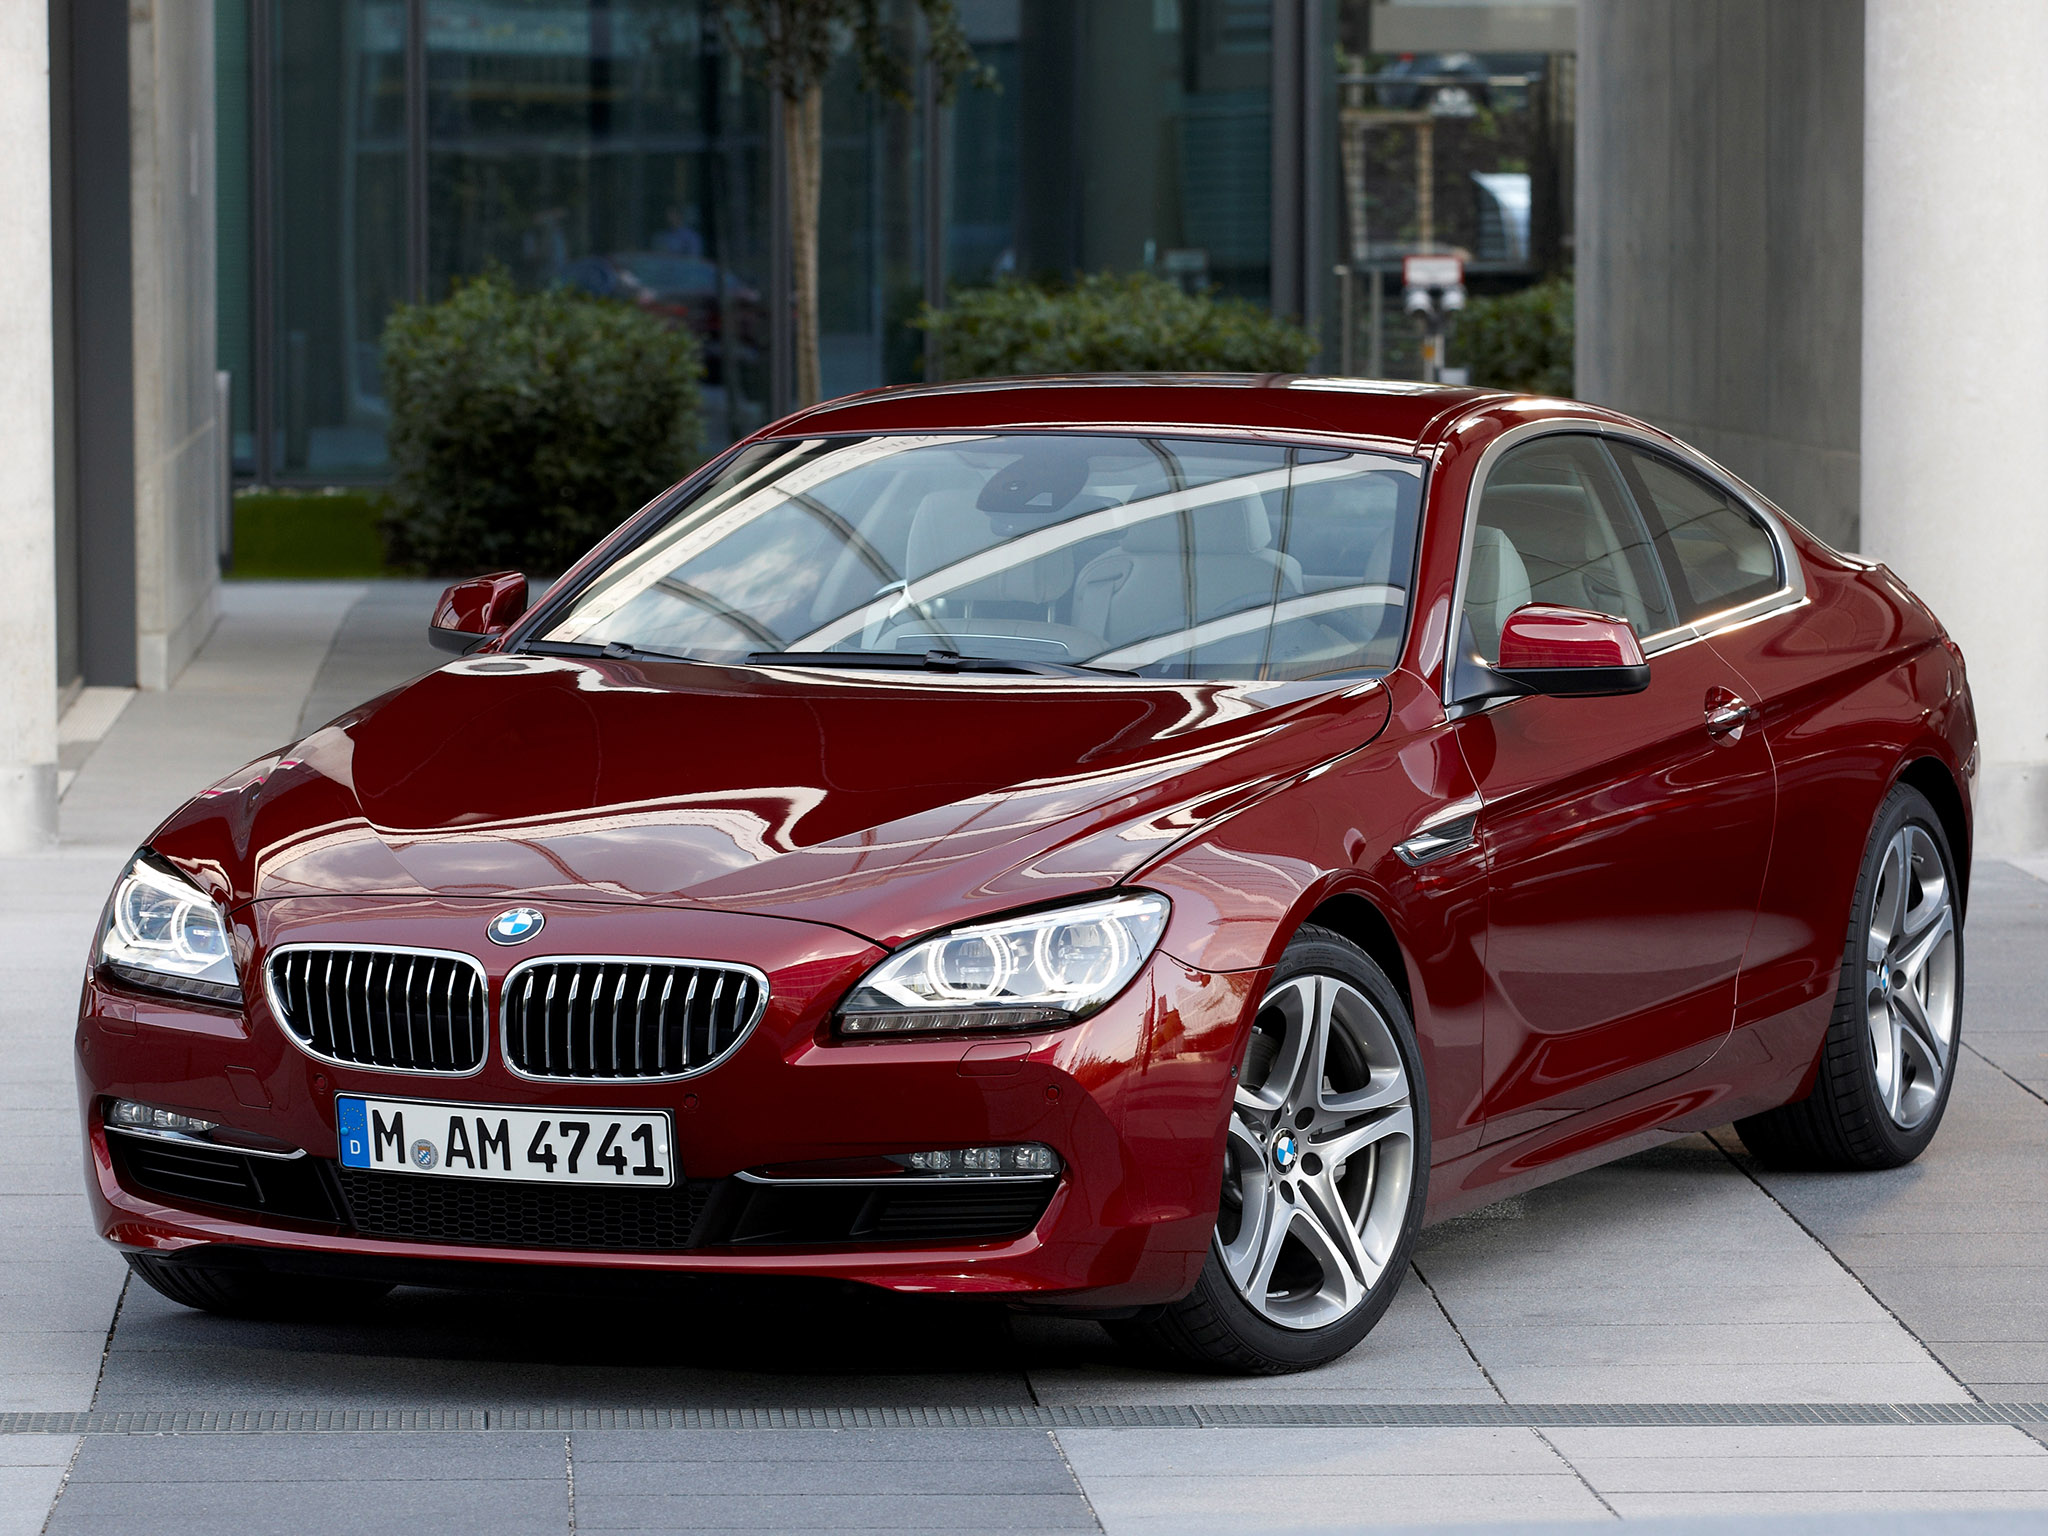 BMW 6Series 640i Coupe F12 2011 BMW 6Series 640i Coupe F12 2011